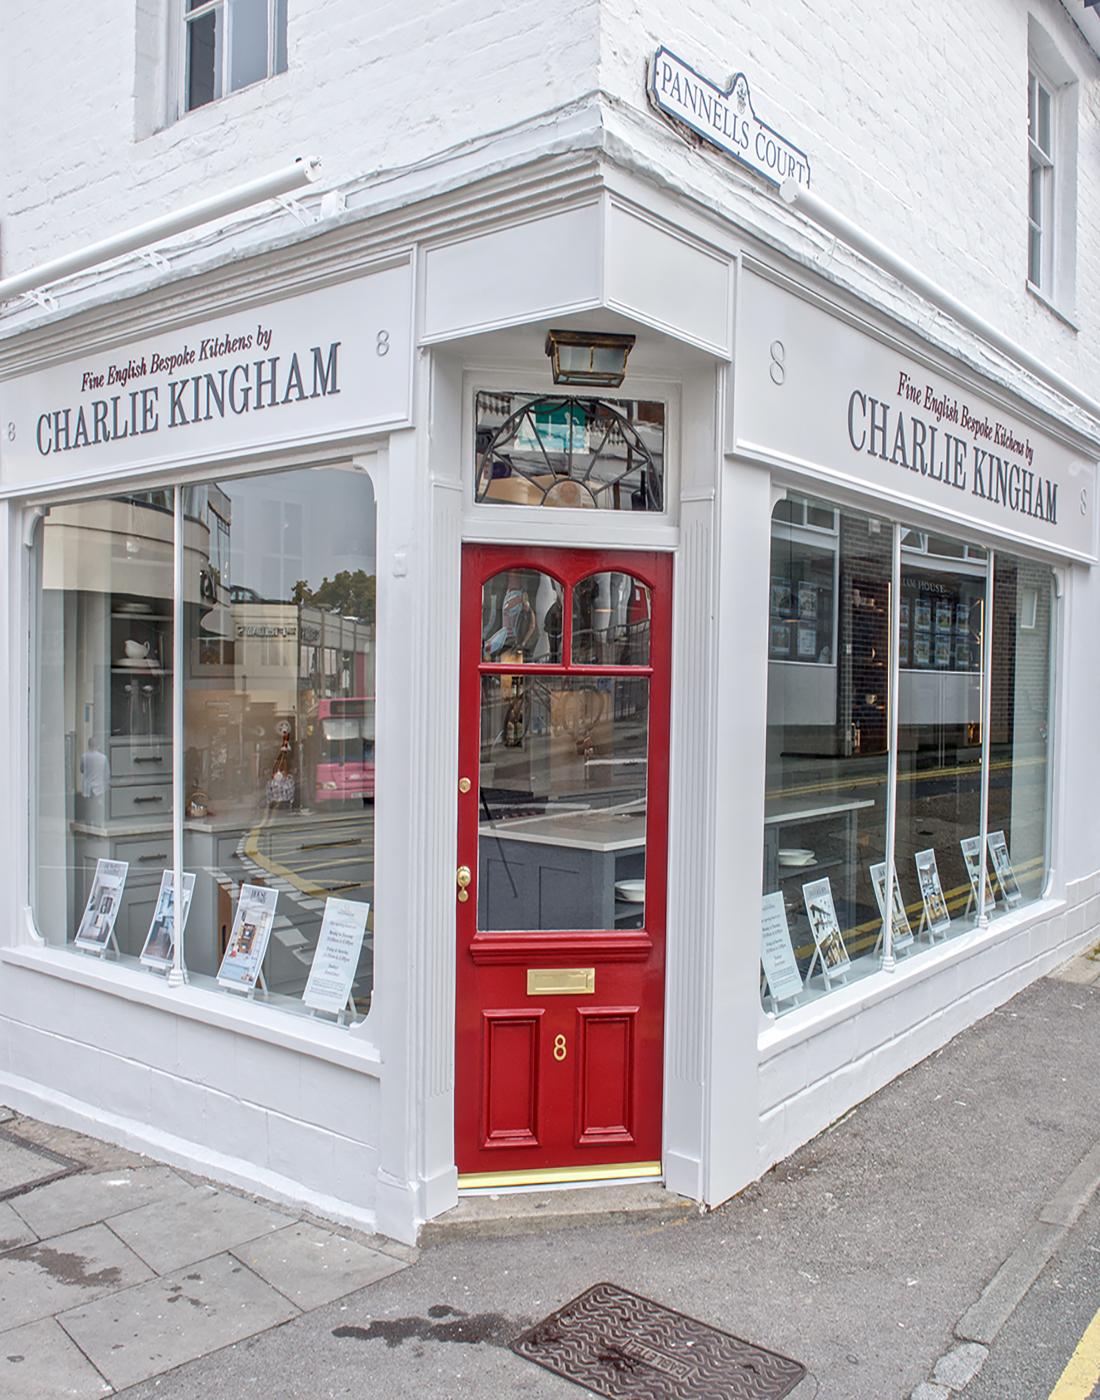 Charlie Kingham bespoke kitchens Guildford showroom red front door with road sign.